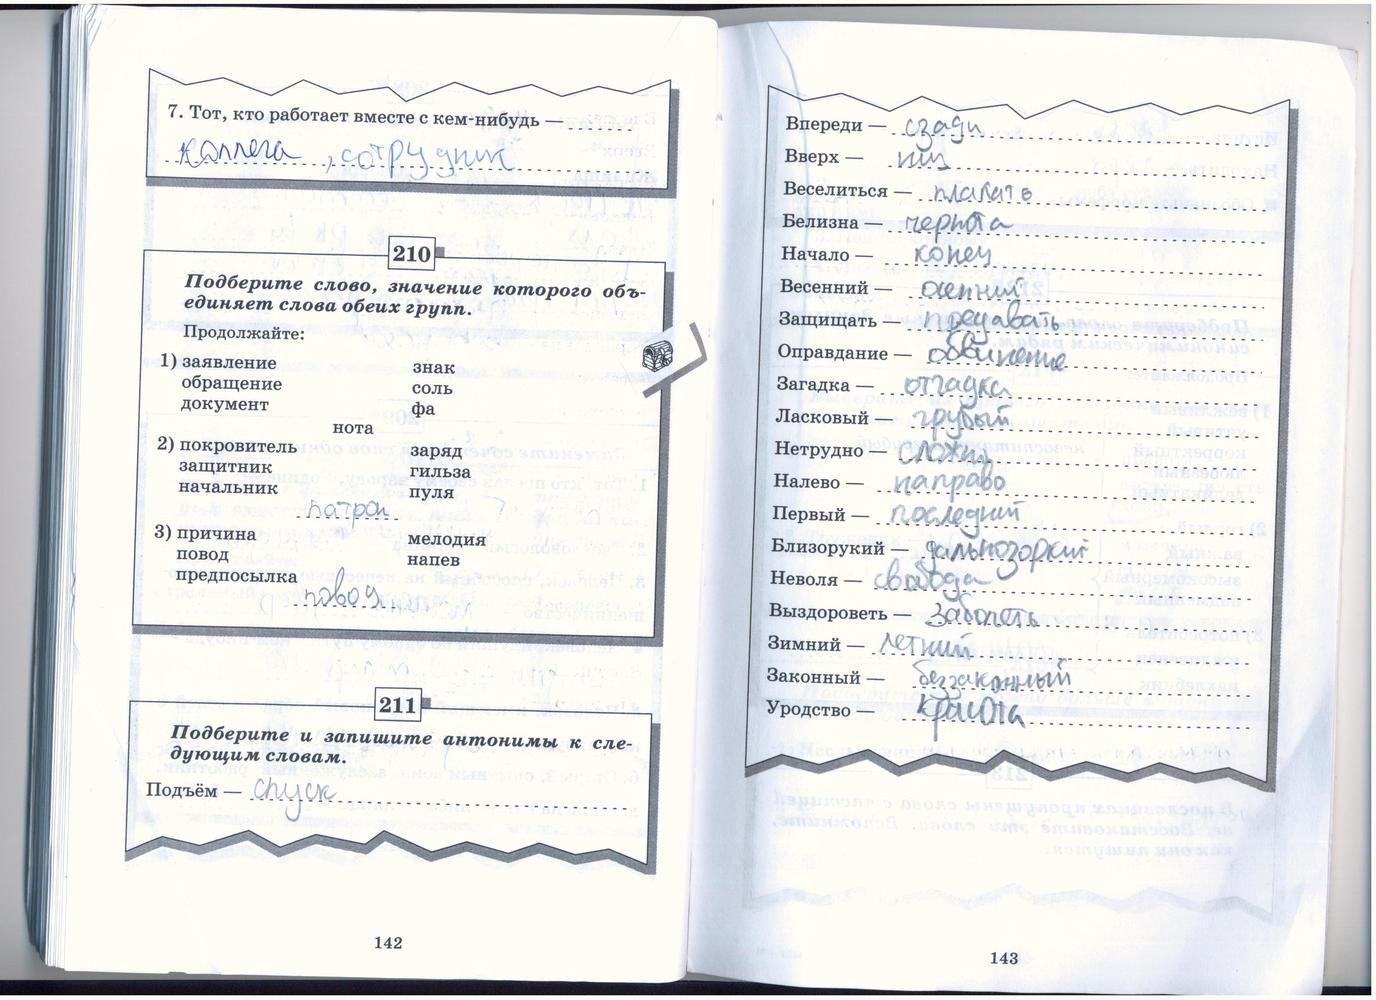 Решебник по французскому языку класс дрофа шацких кузнецова  Решебник по французскому языку 8 класс дрофа шацких кузнецова